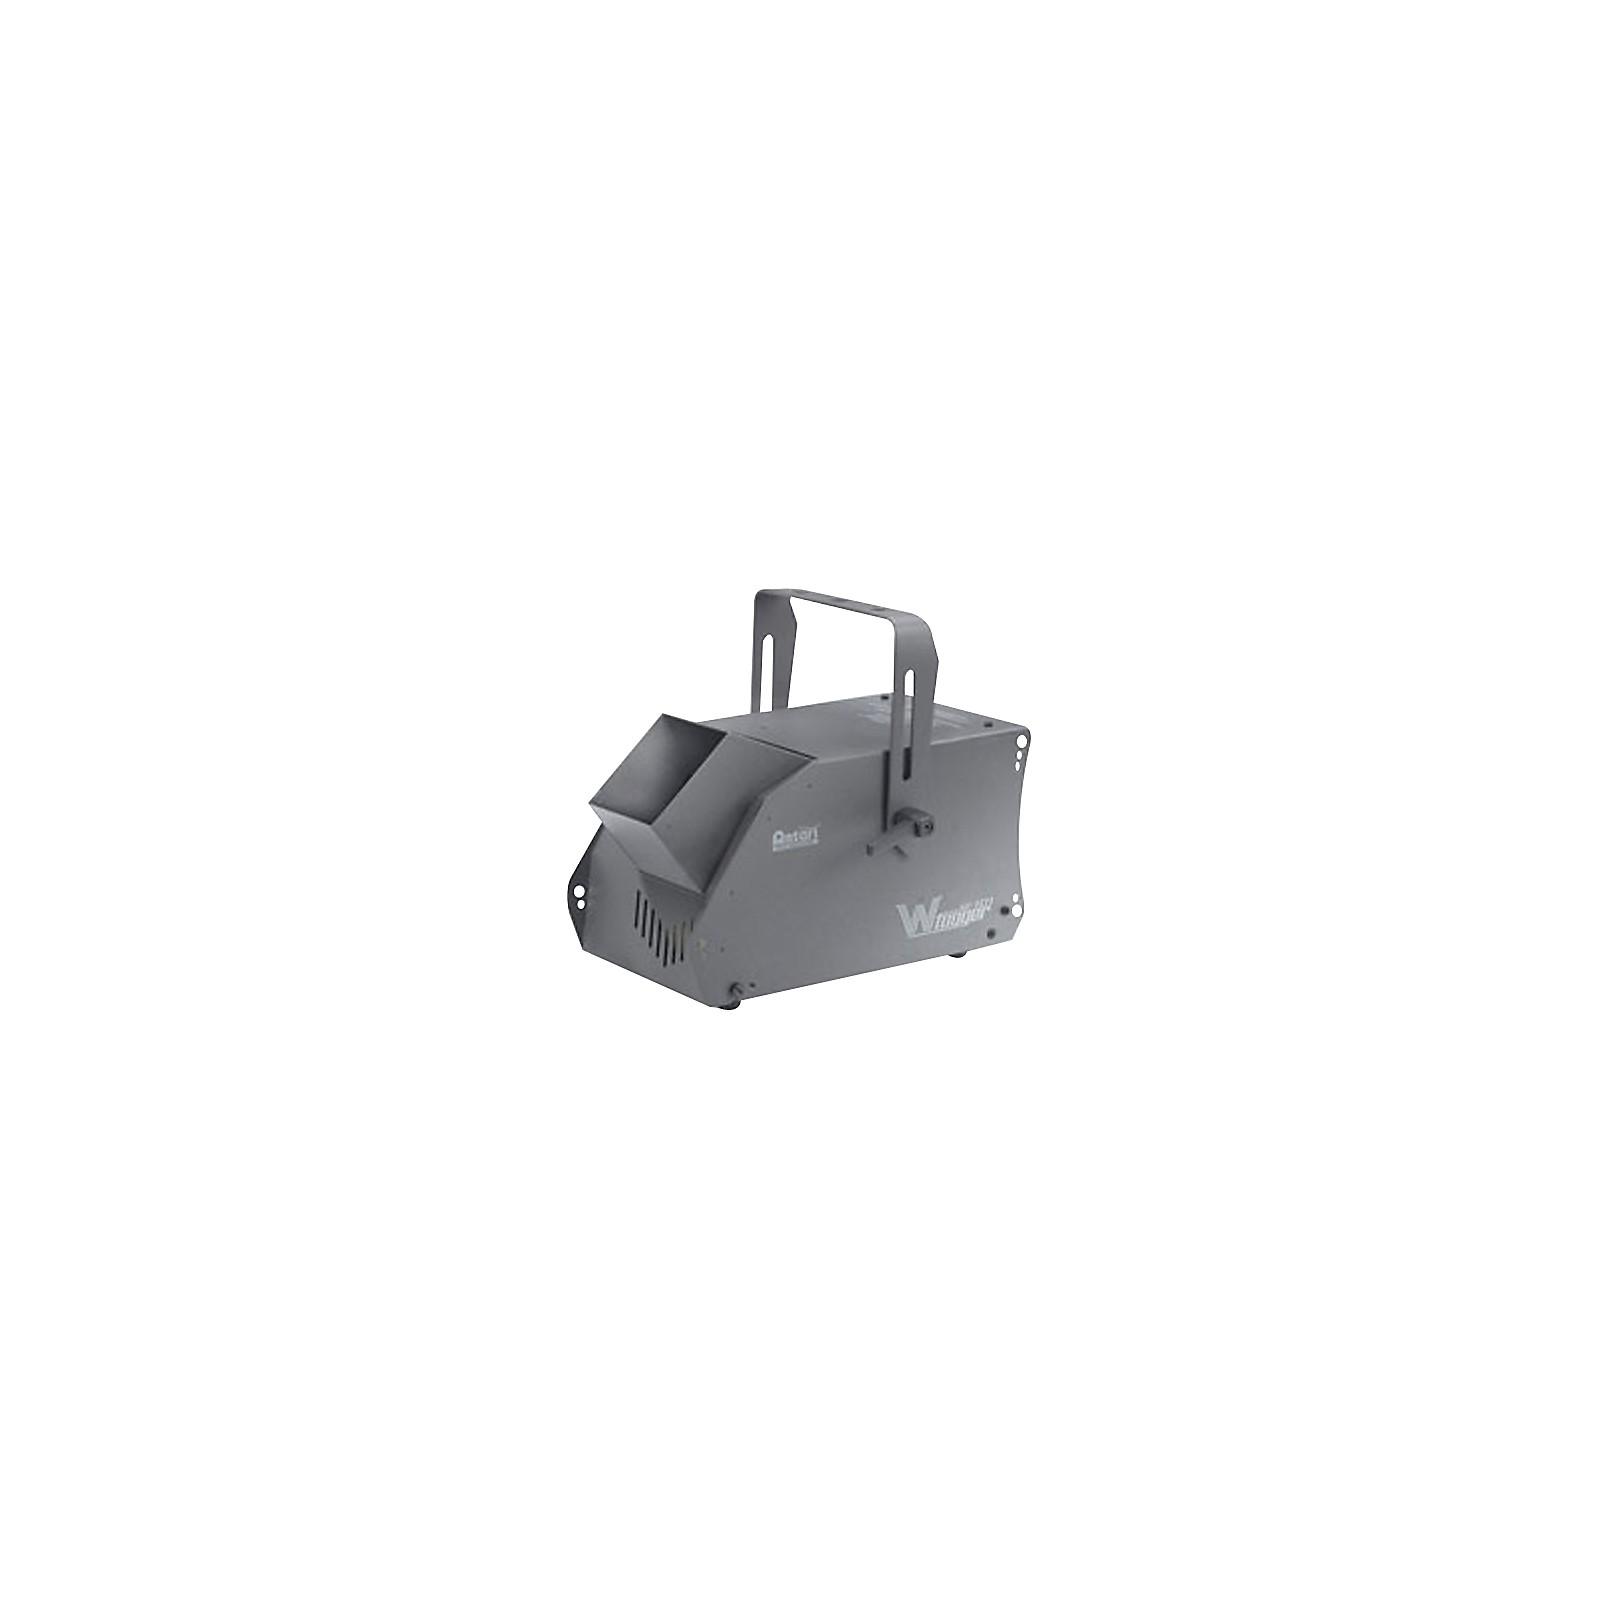 Antari W101 Wireless High Output Bubble Machine